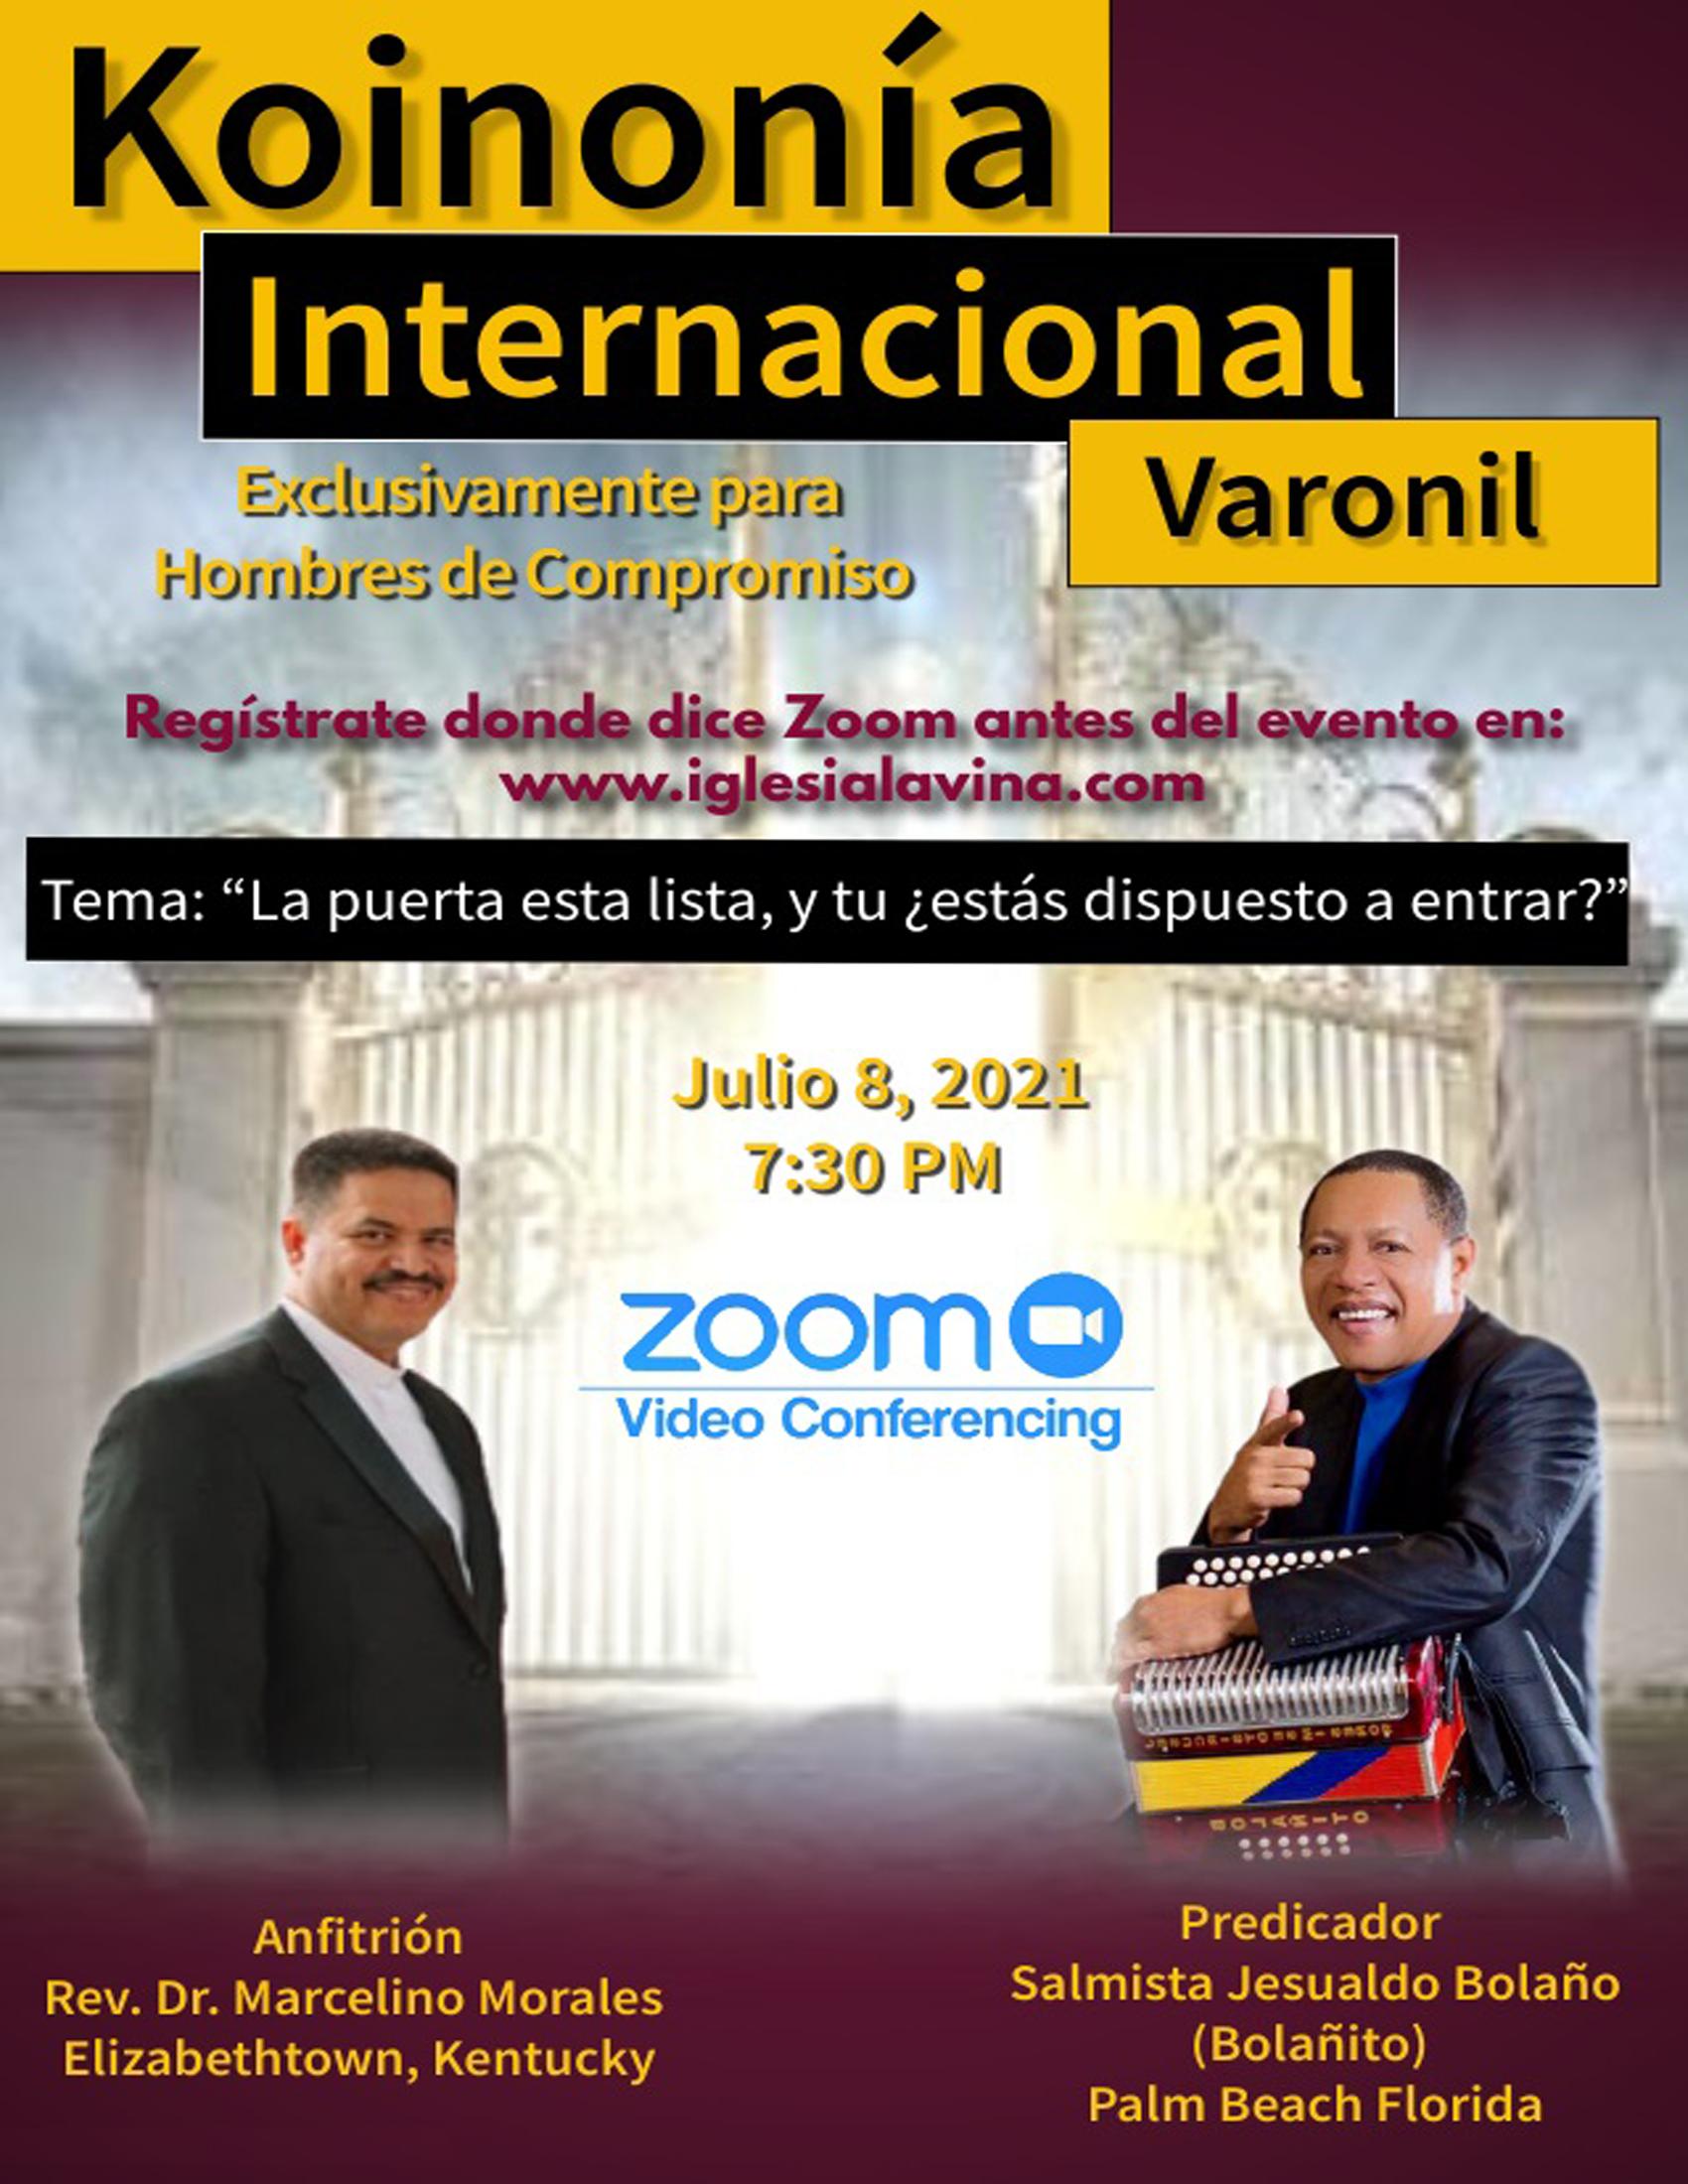 Koinonía 8-5-2021 - Jesualdo Bolaño (Bol